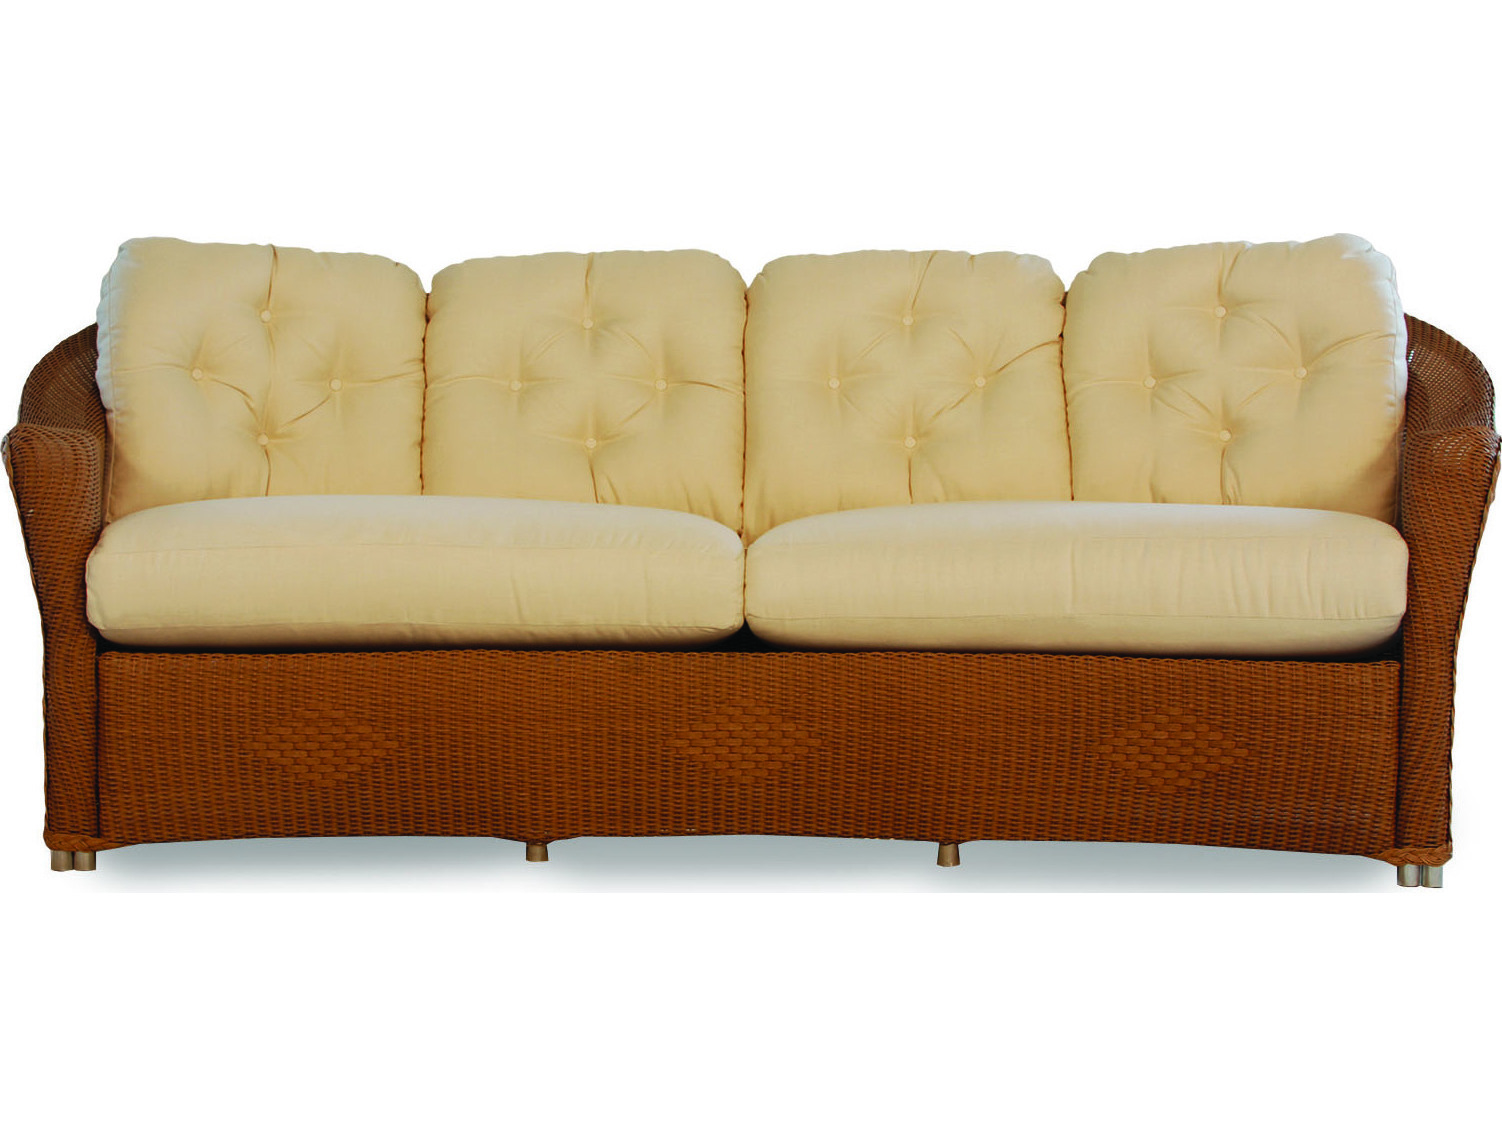 lloyd s of chatham sofa sleeping bed ikea flanders reflections wicker crescent 9059